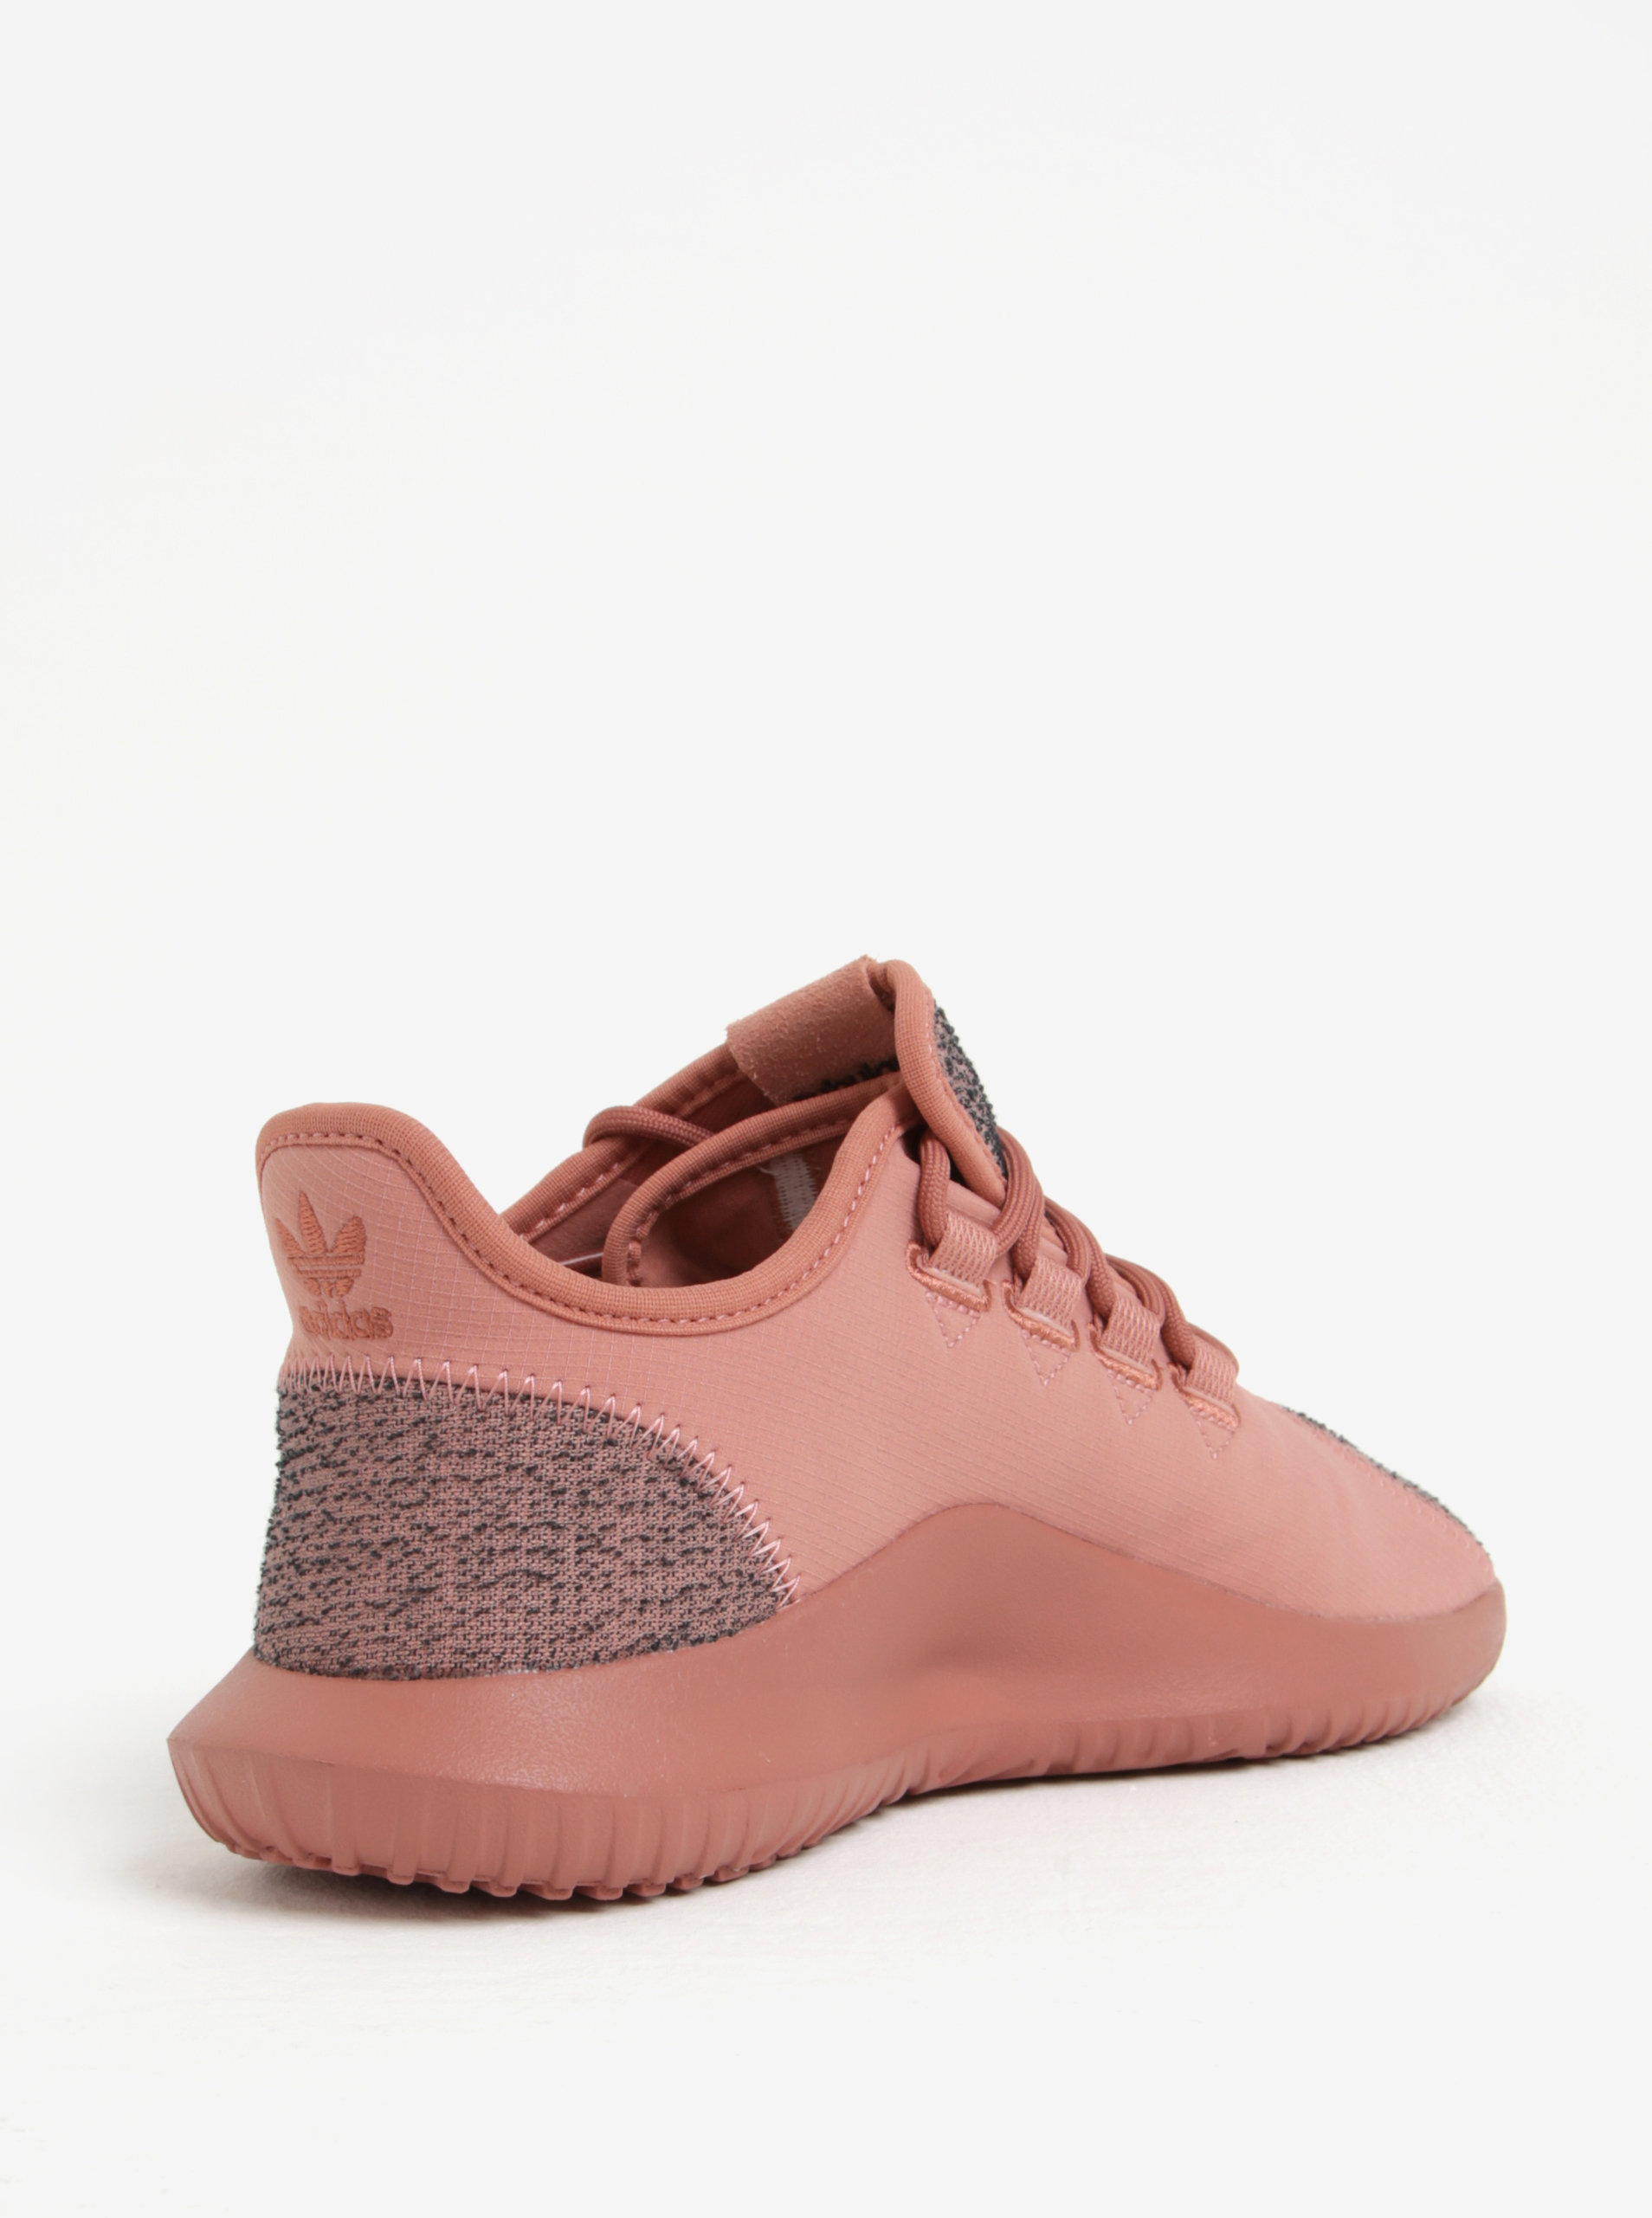 Šedo-růžové dámské tenisky adidas Originals Tubular Shadow ... feb536fc1df